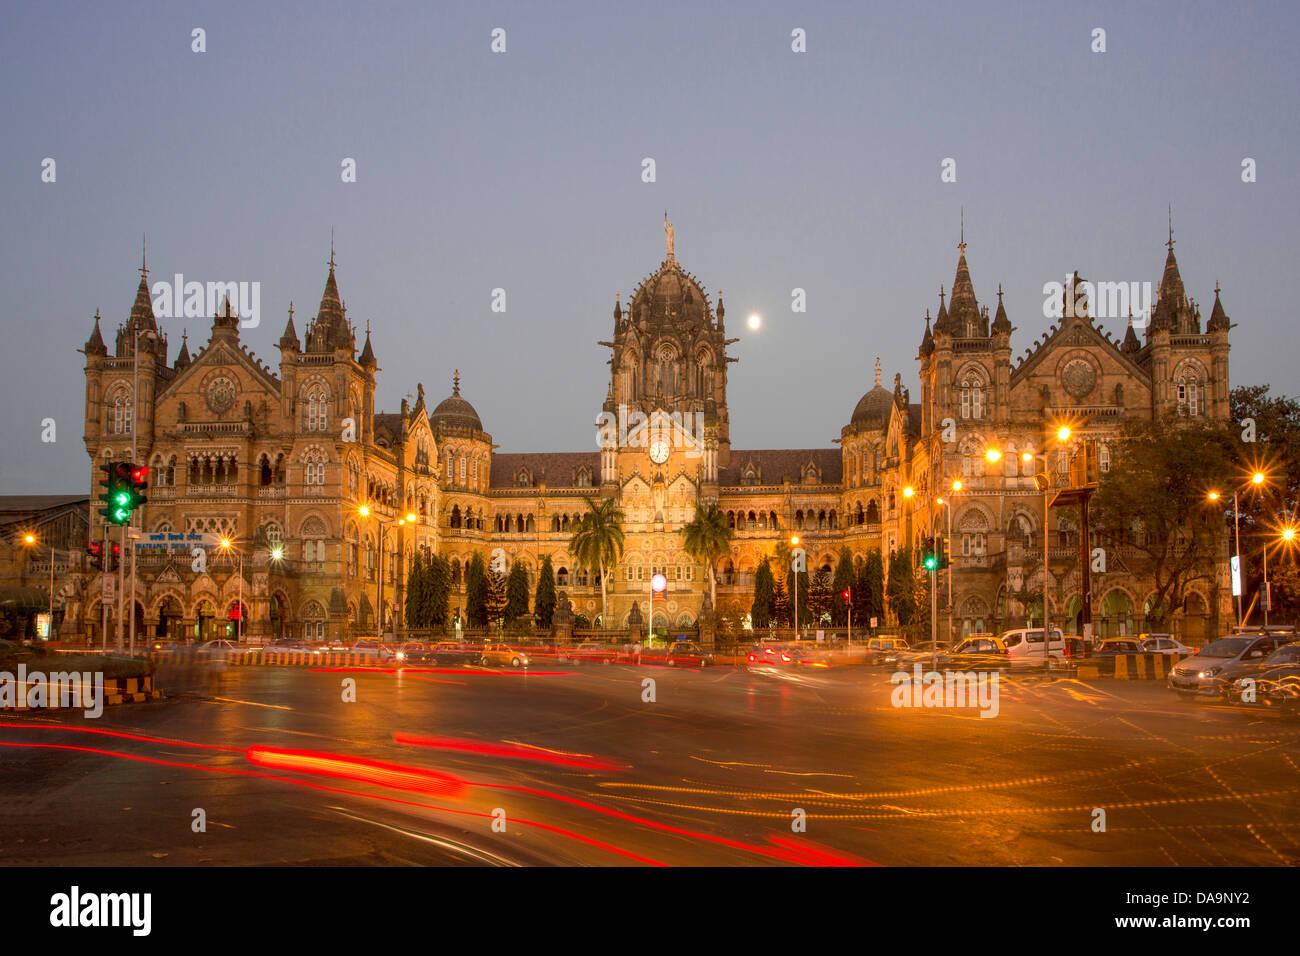 Indien, Süd-Indien, Asien, Maharashtra, Mumbai, Bombay, Stadt, Dadabhai Naoroji, Road, Victoria Station, Chatrapati Stockbild